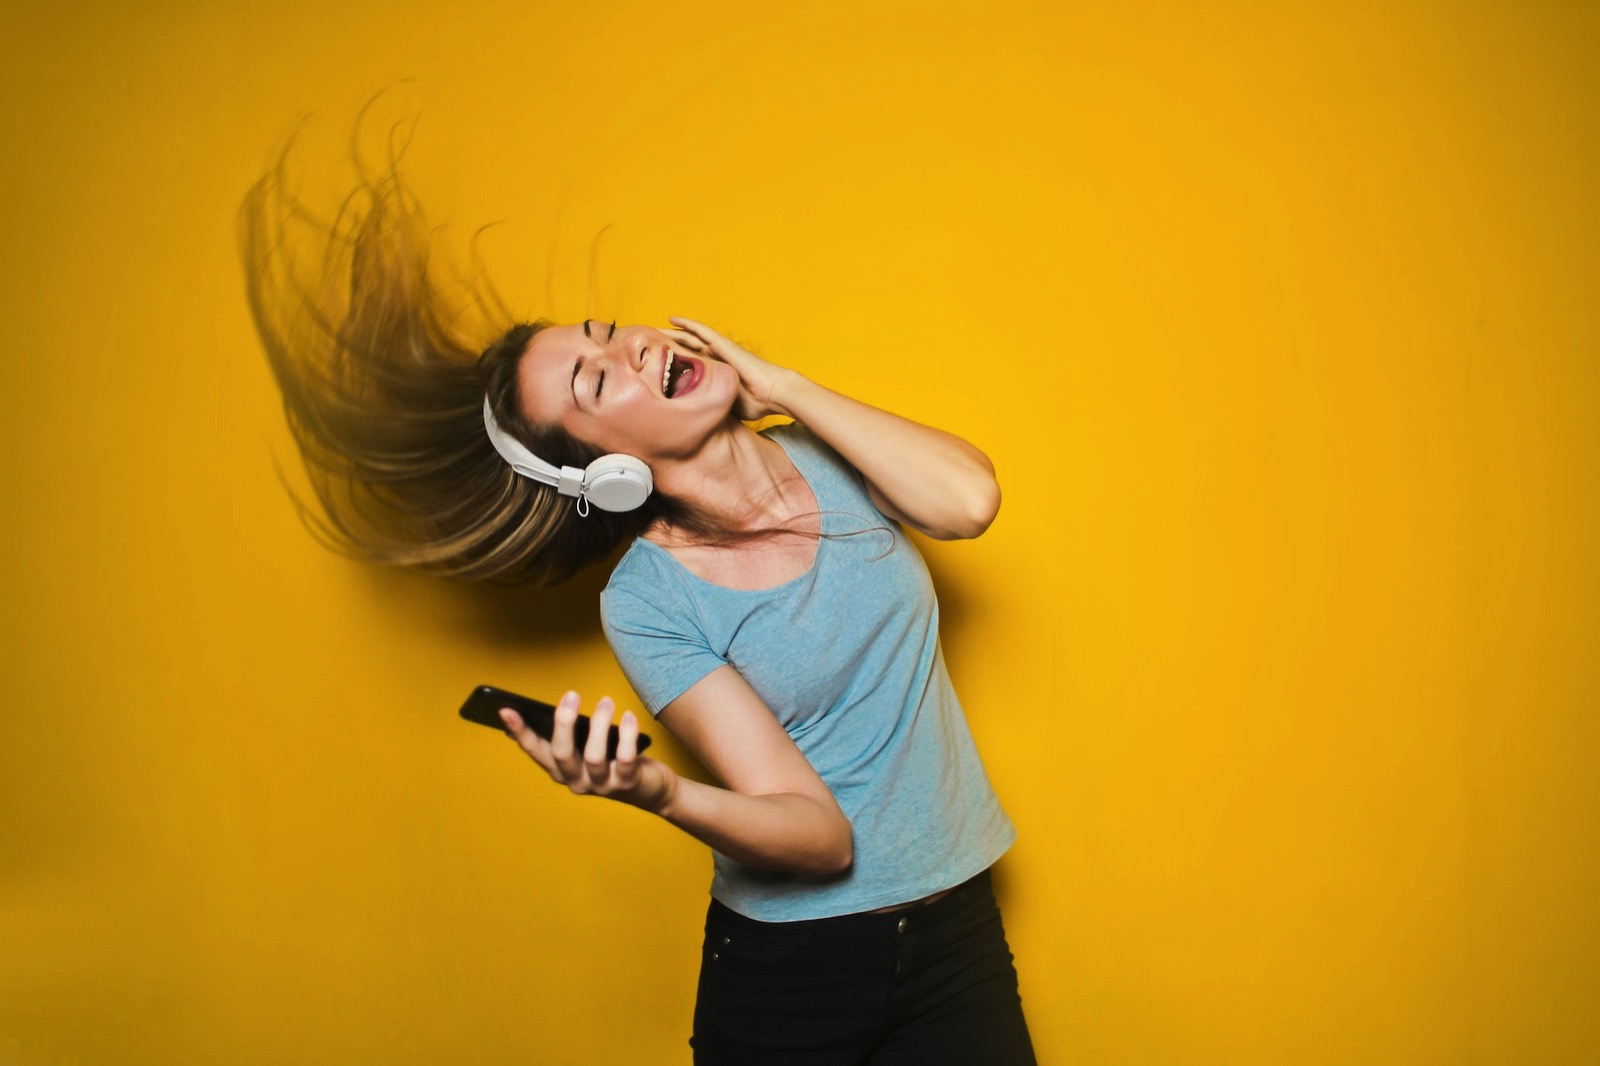 Bruce mars 558710 unsplash woman with headphones